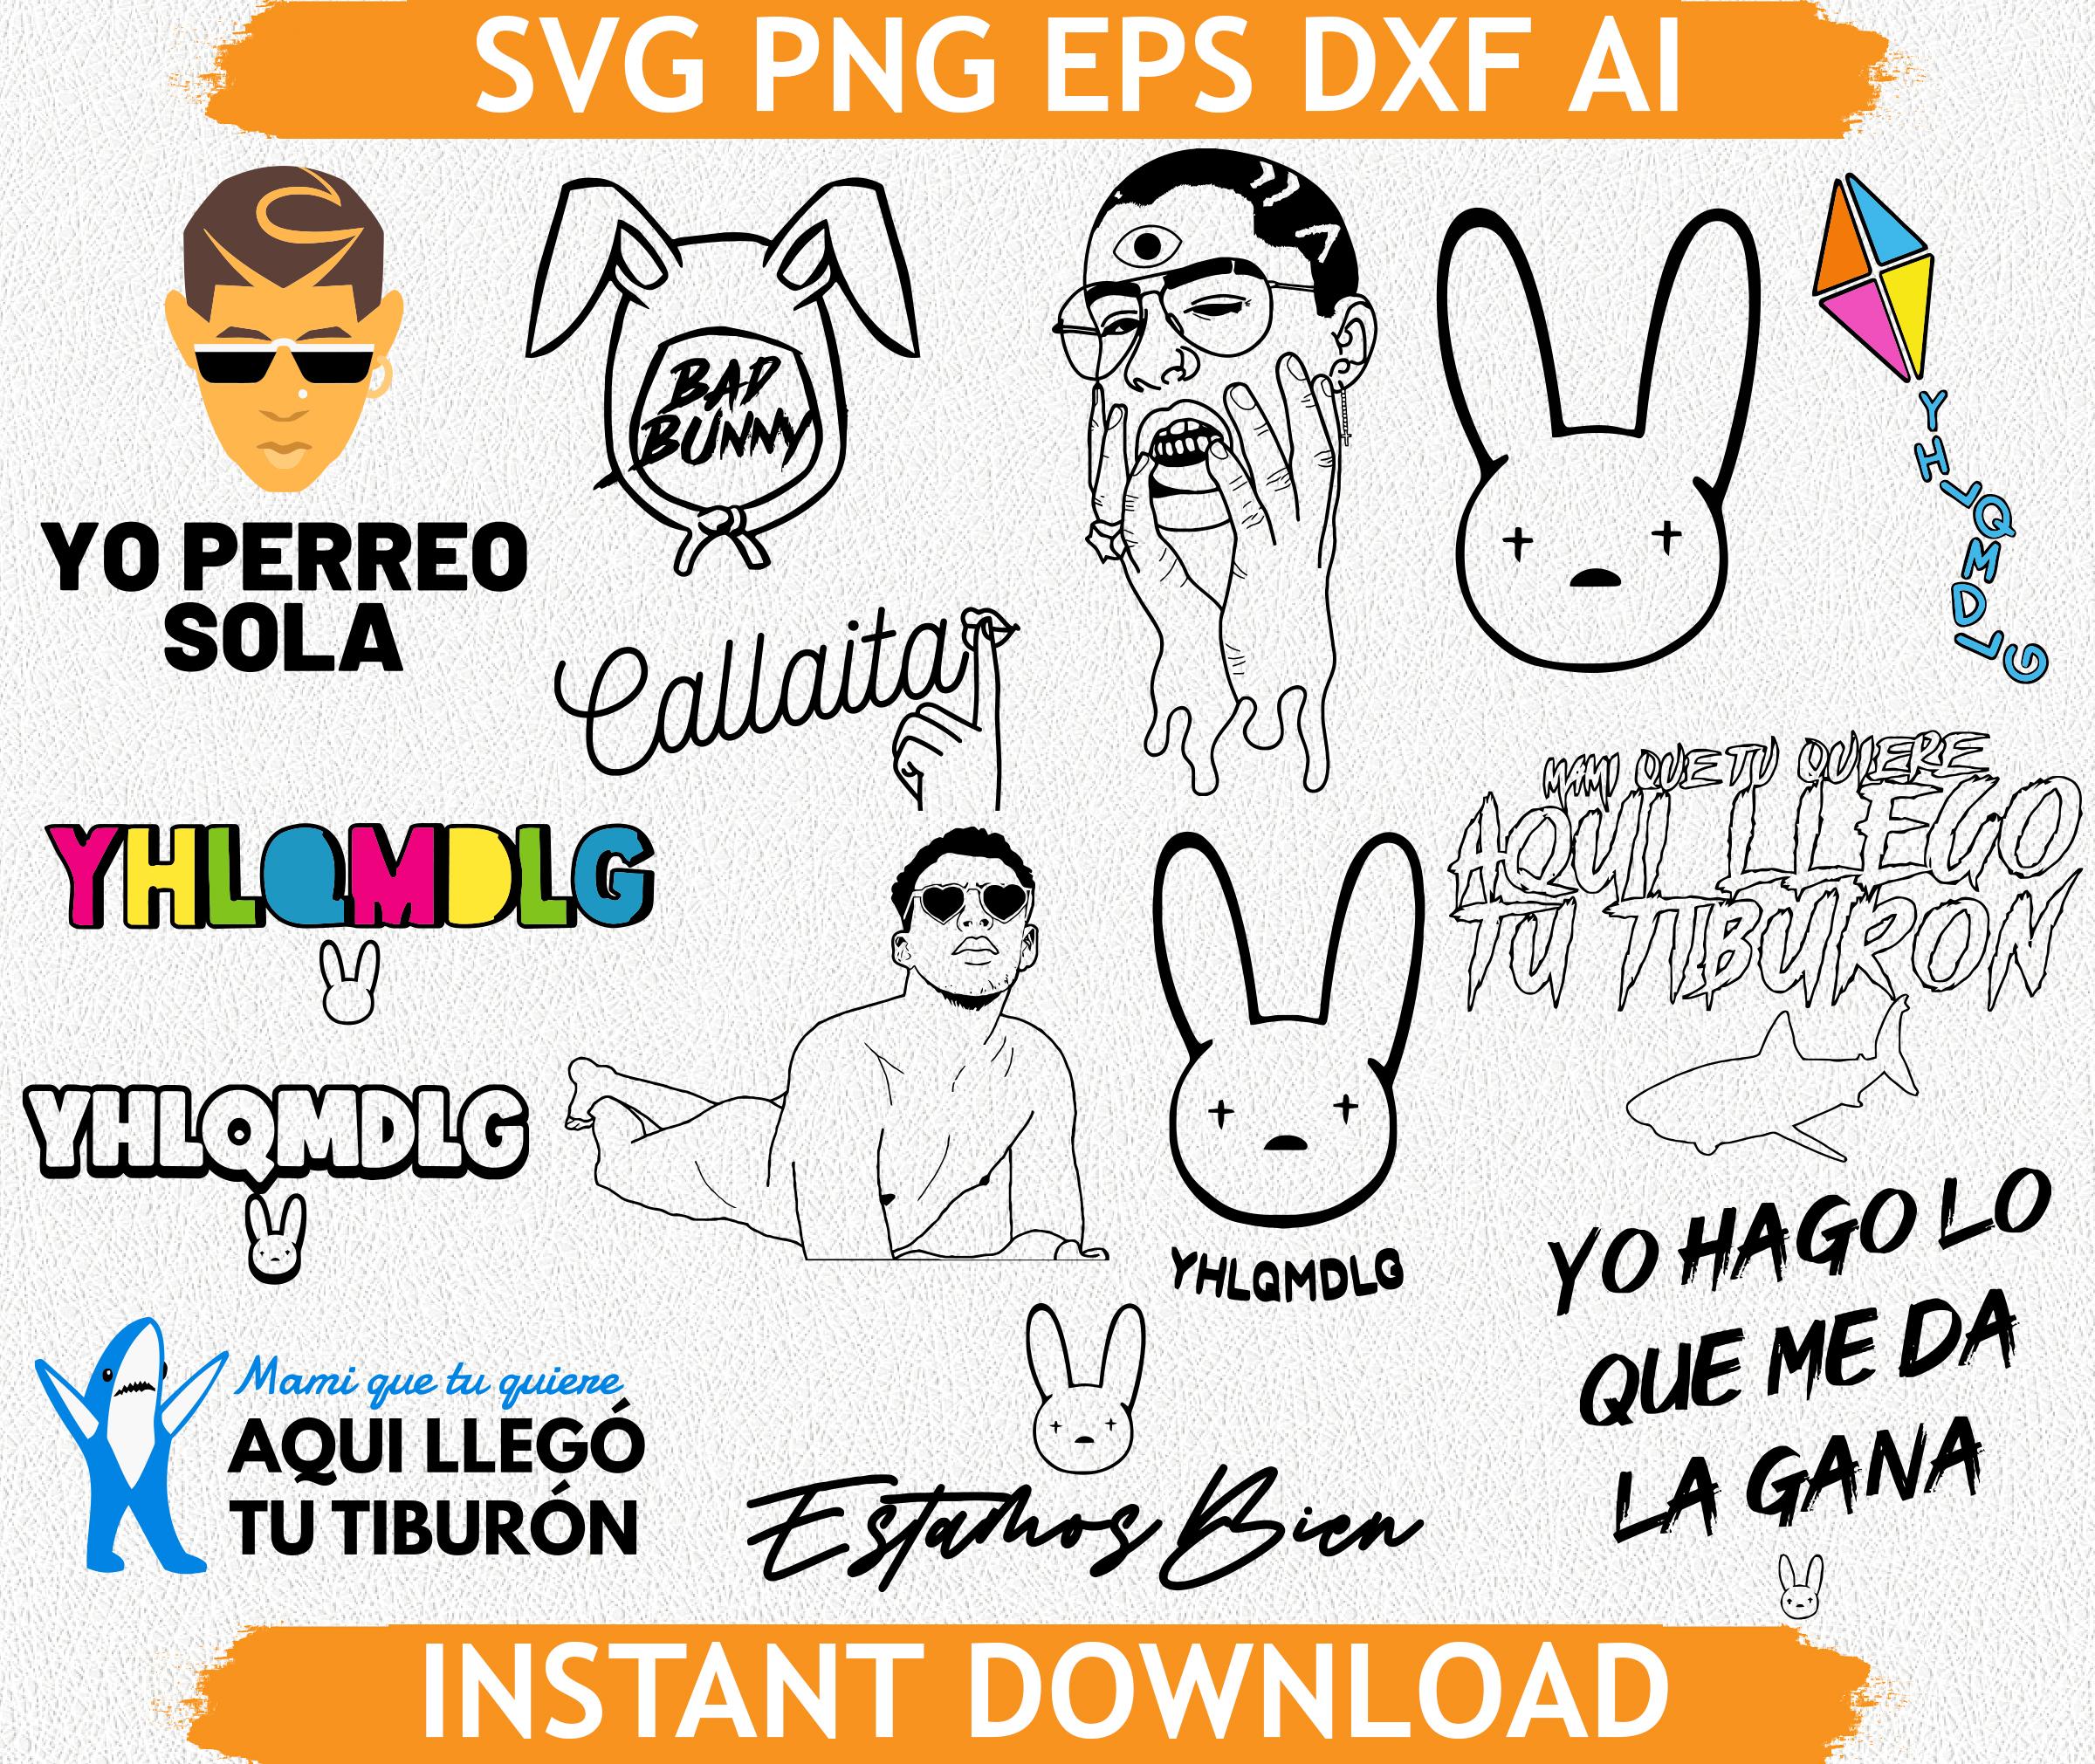 Bad Bunny Eps Bad Bunny Ai J Balvin Png J By Bigsvgbundle On Zibbet